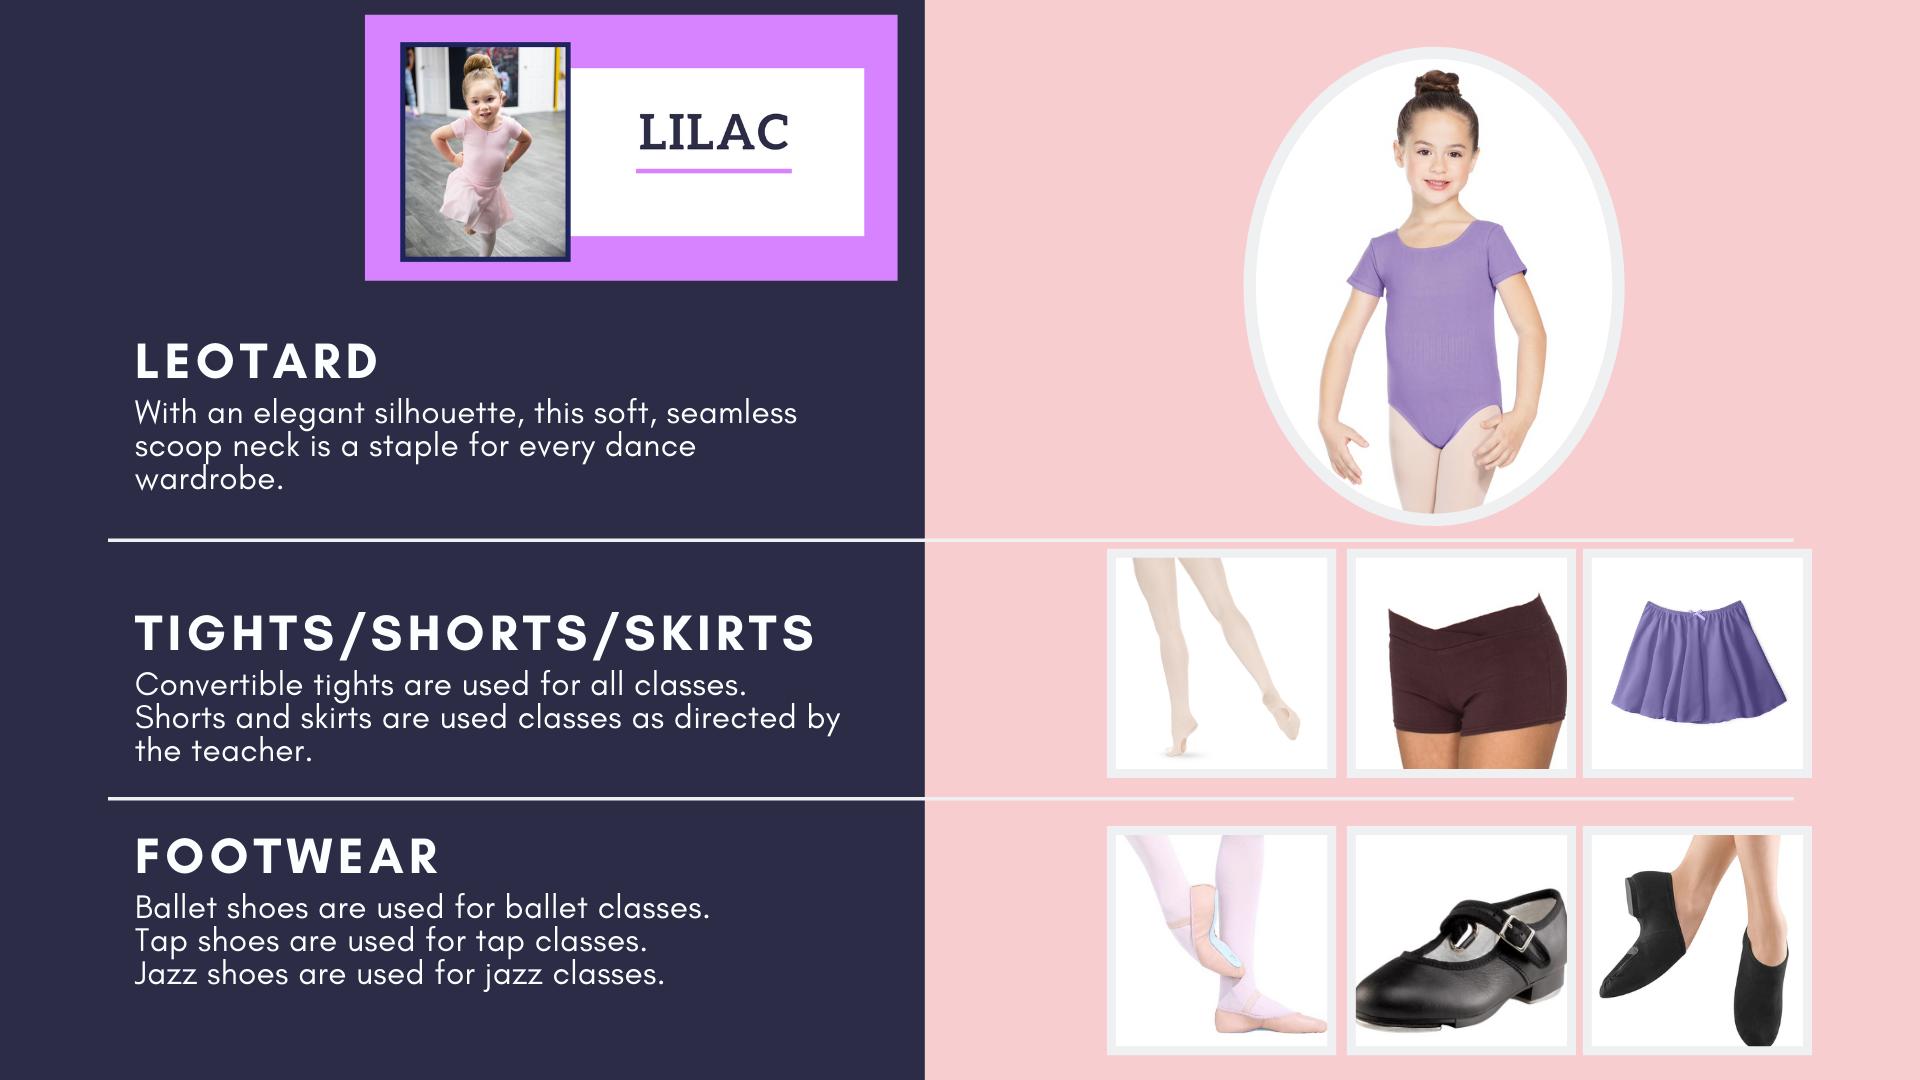 Lilac Uniform